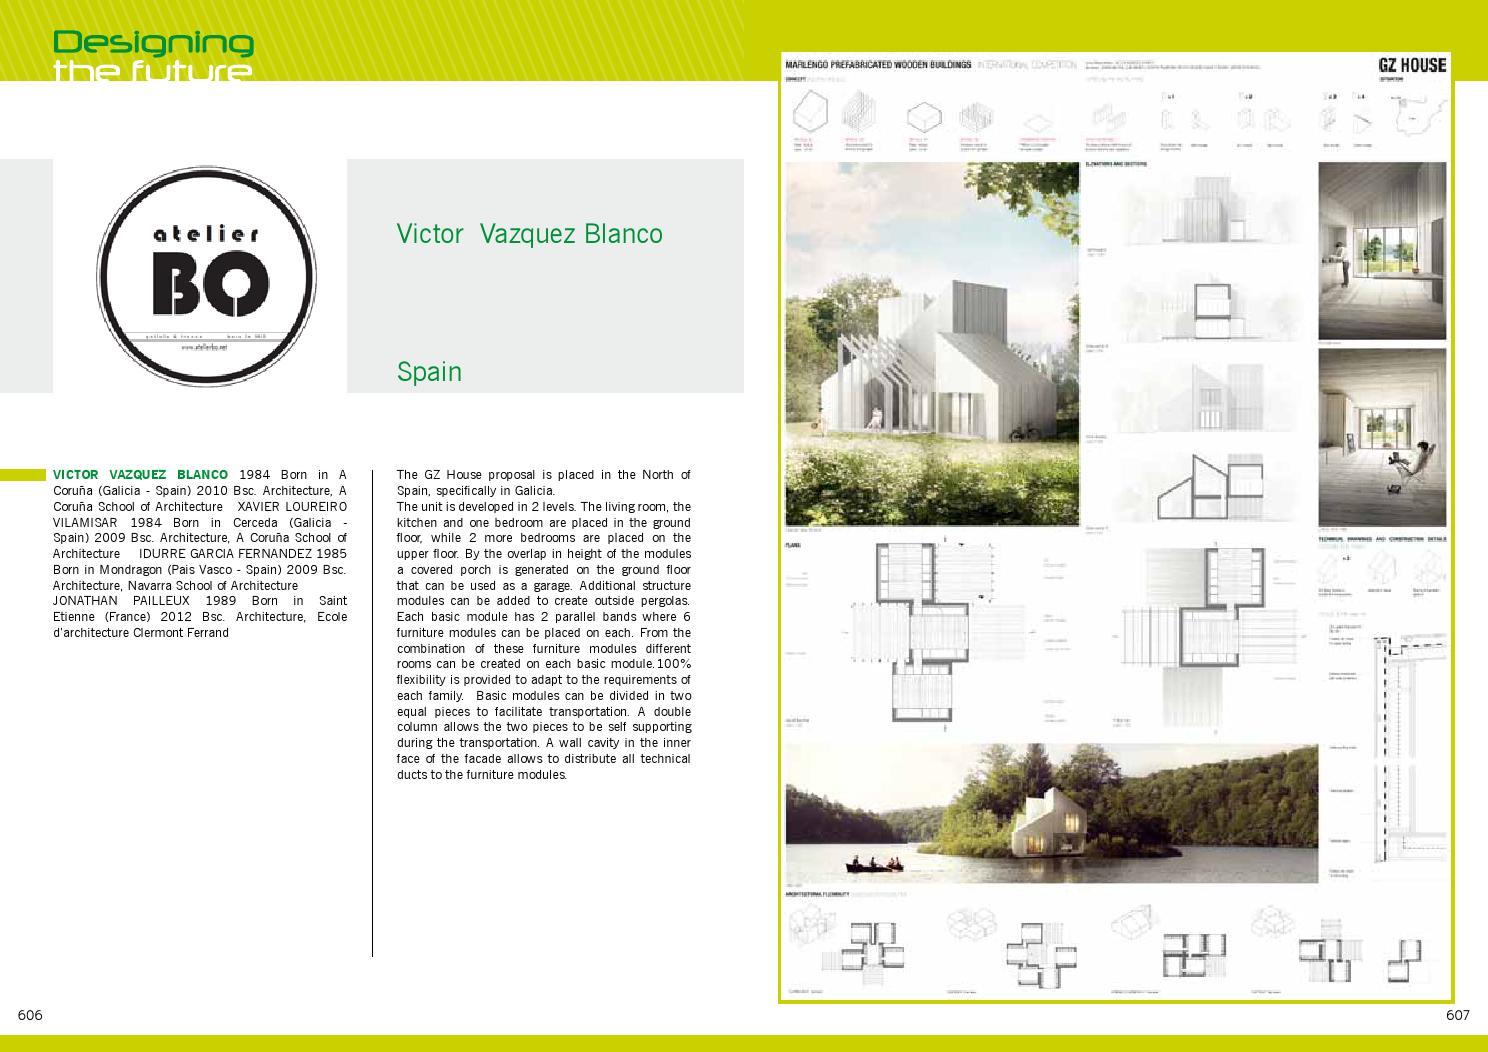 "École D Architecture Clermont contest catalogue ""designing the future""marlegno - issuu"